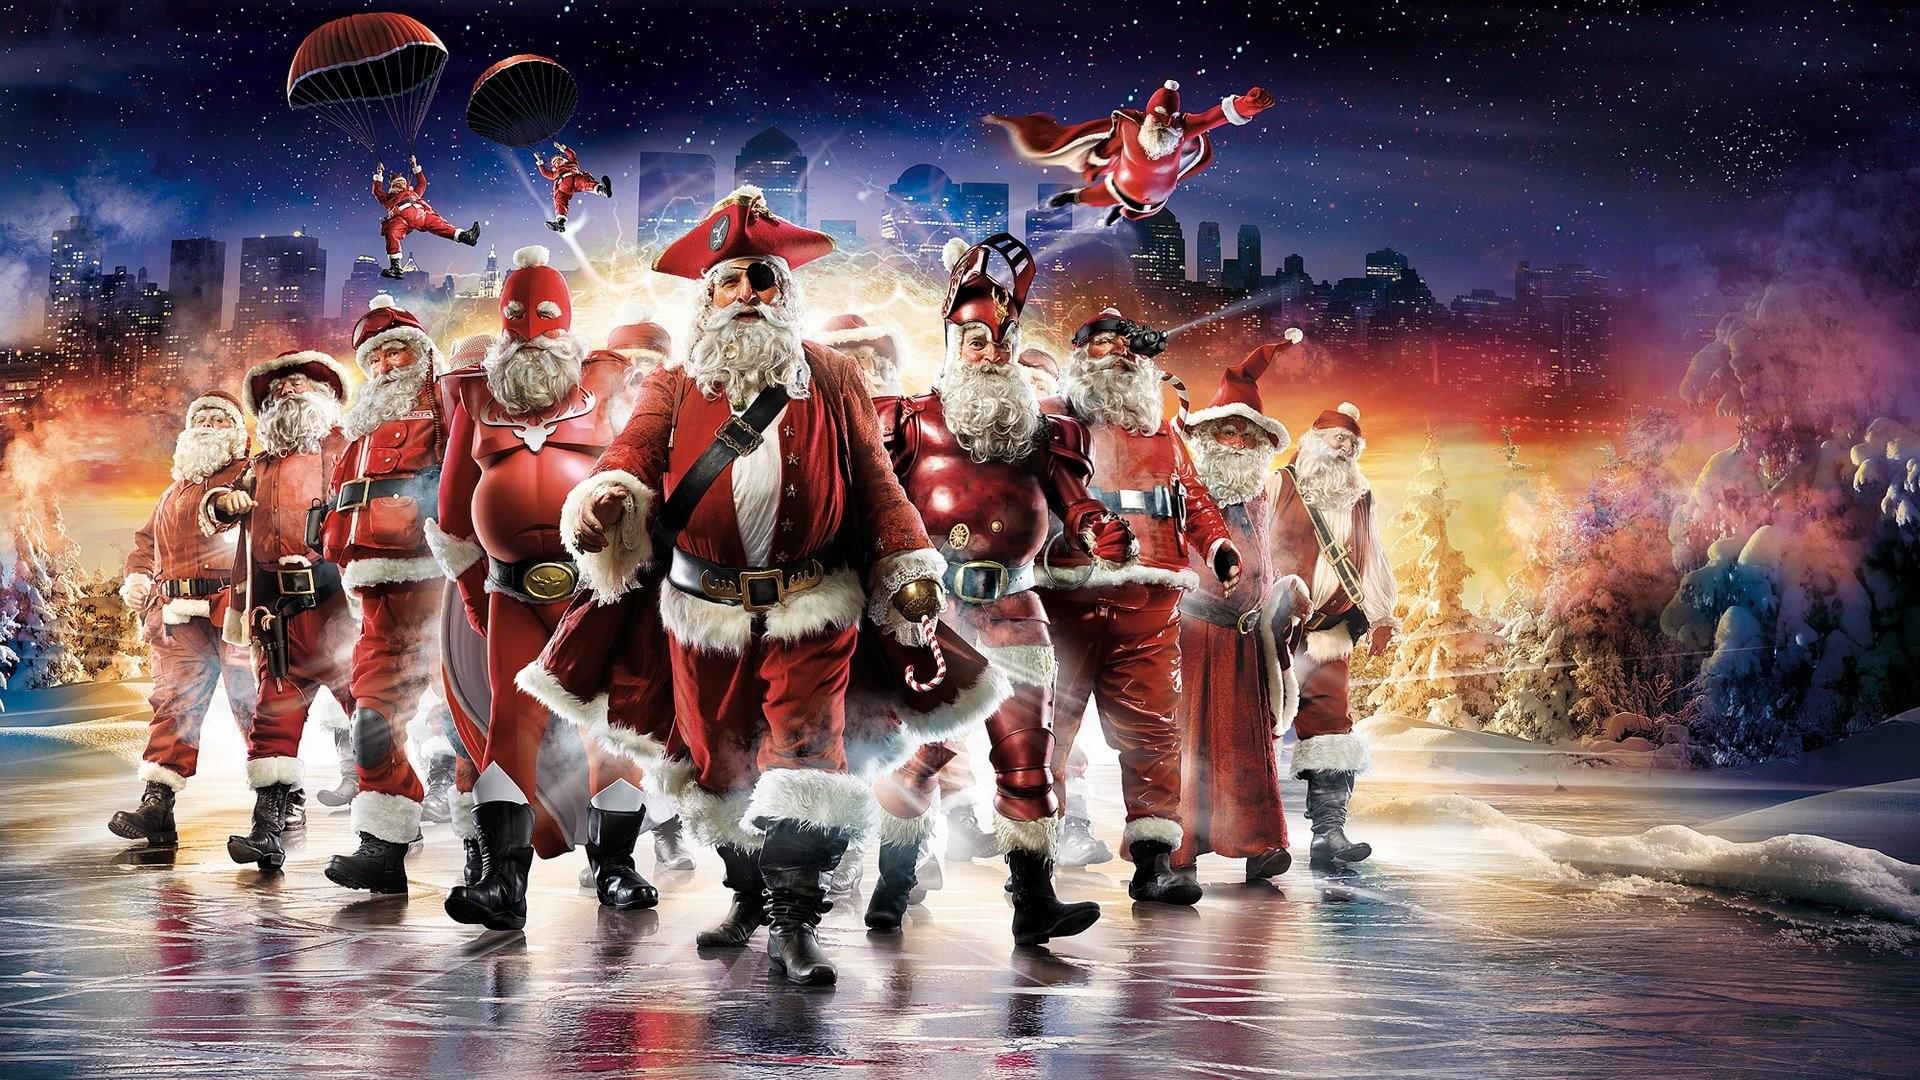 Funny Christmas Wallpaper.Funny Christmas Wallpaper 62 Images